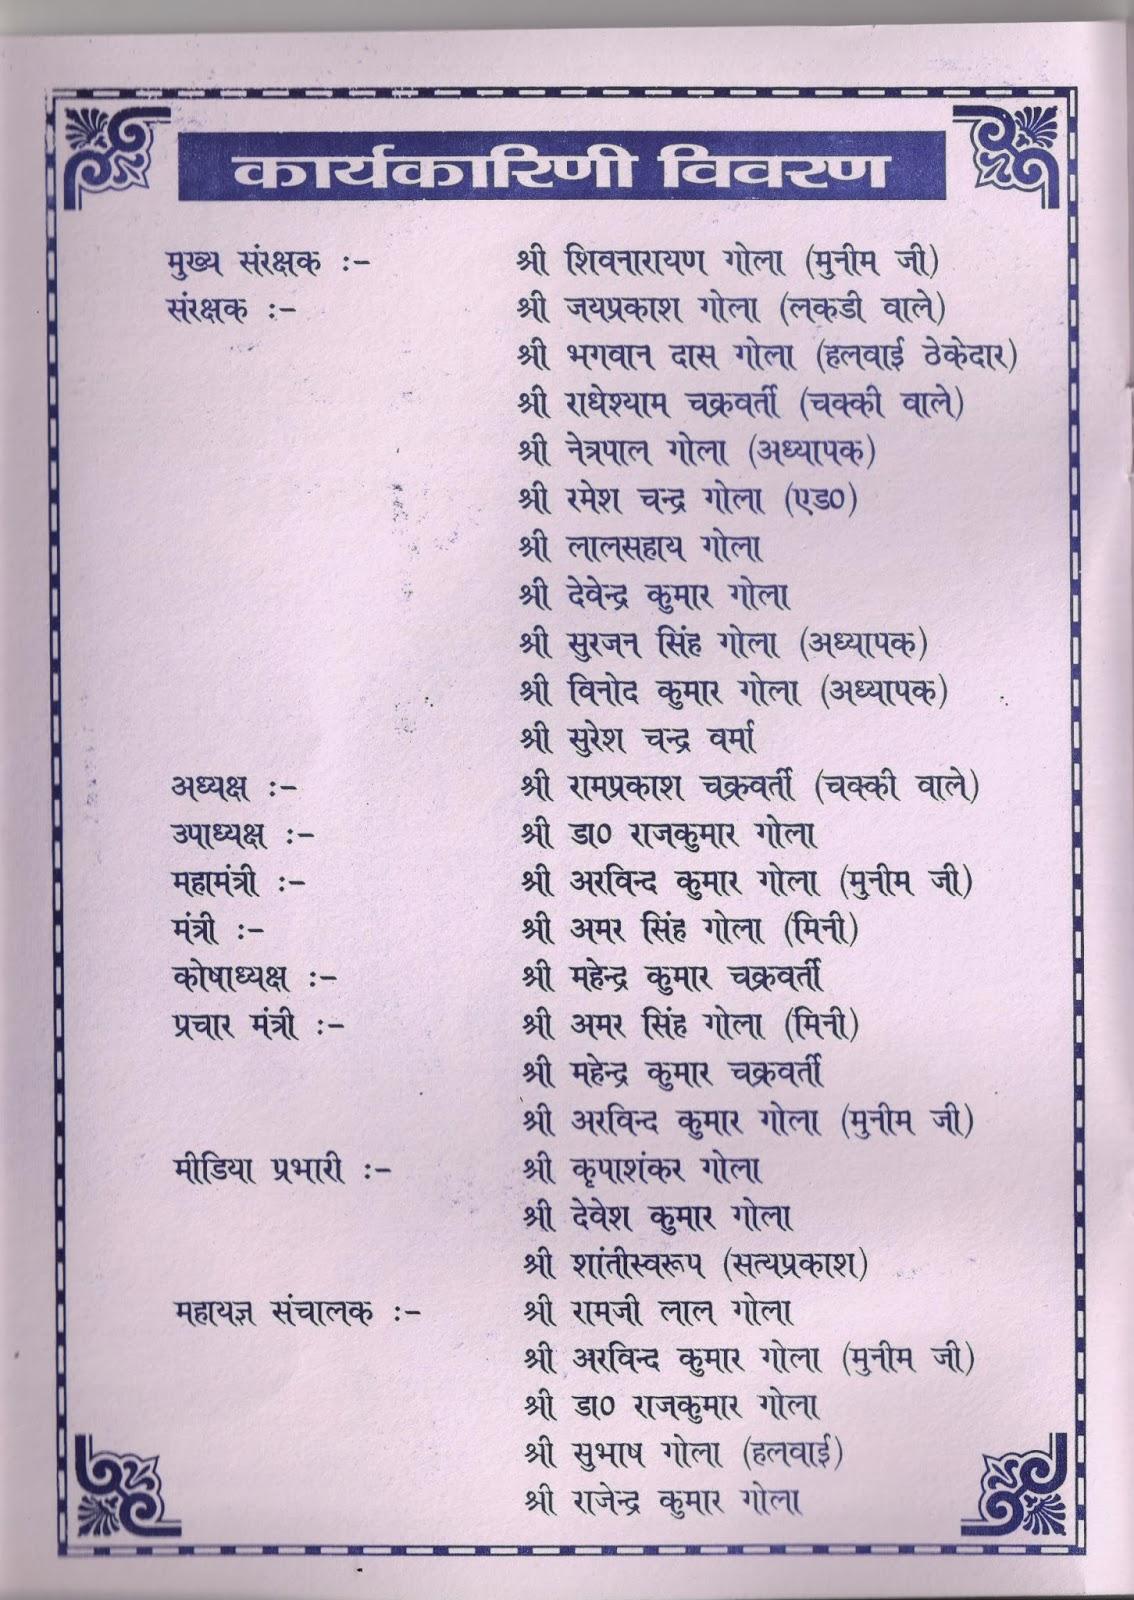 committee member list committee member list